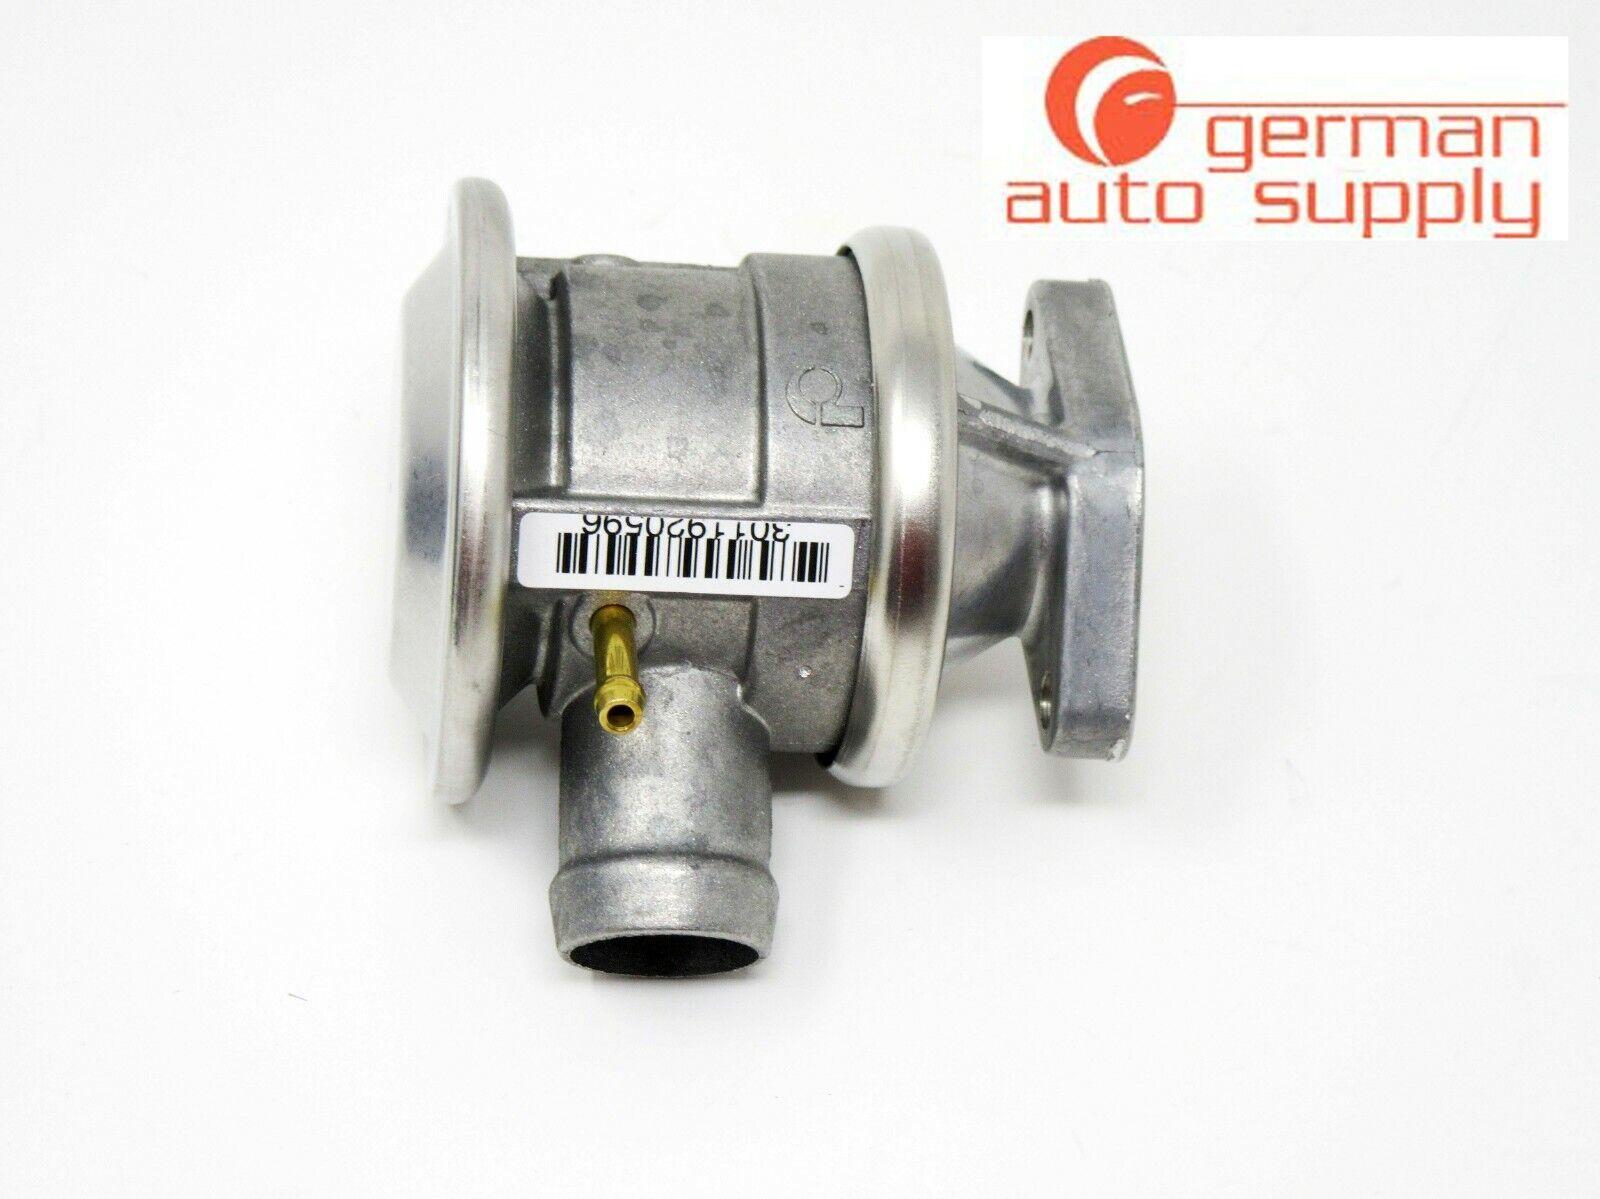 For Porsche Boxster Secondary Air Injection Shut-Off Valve Pierburg 722938060